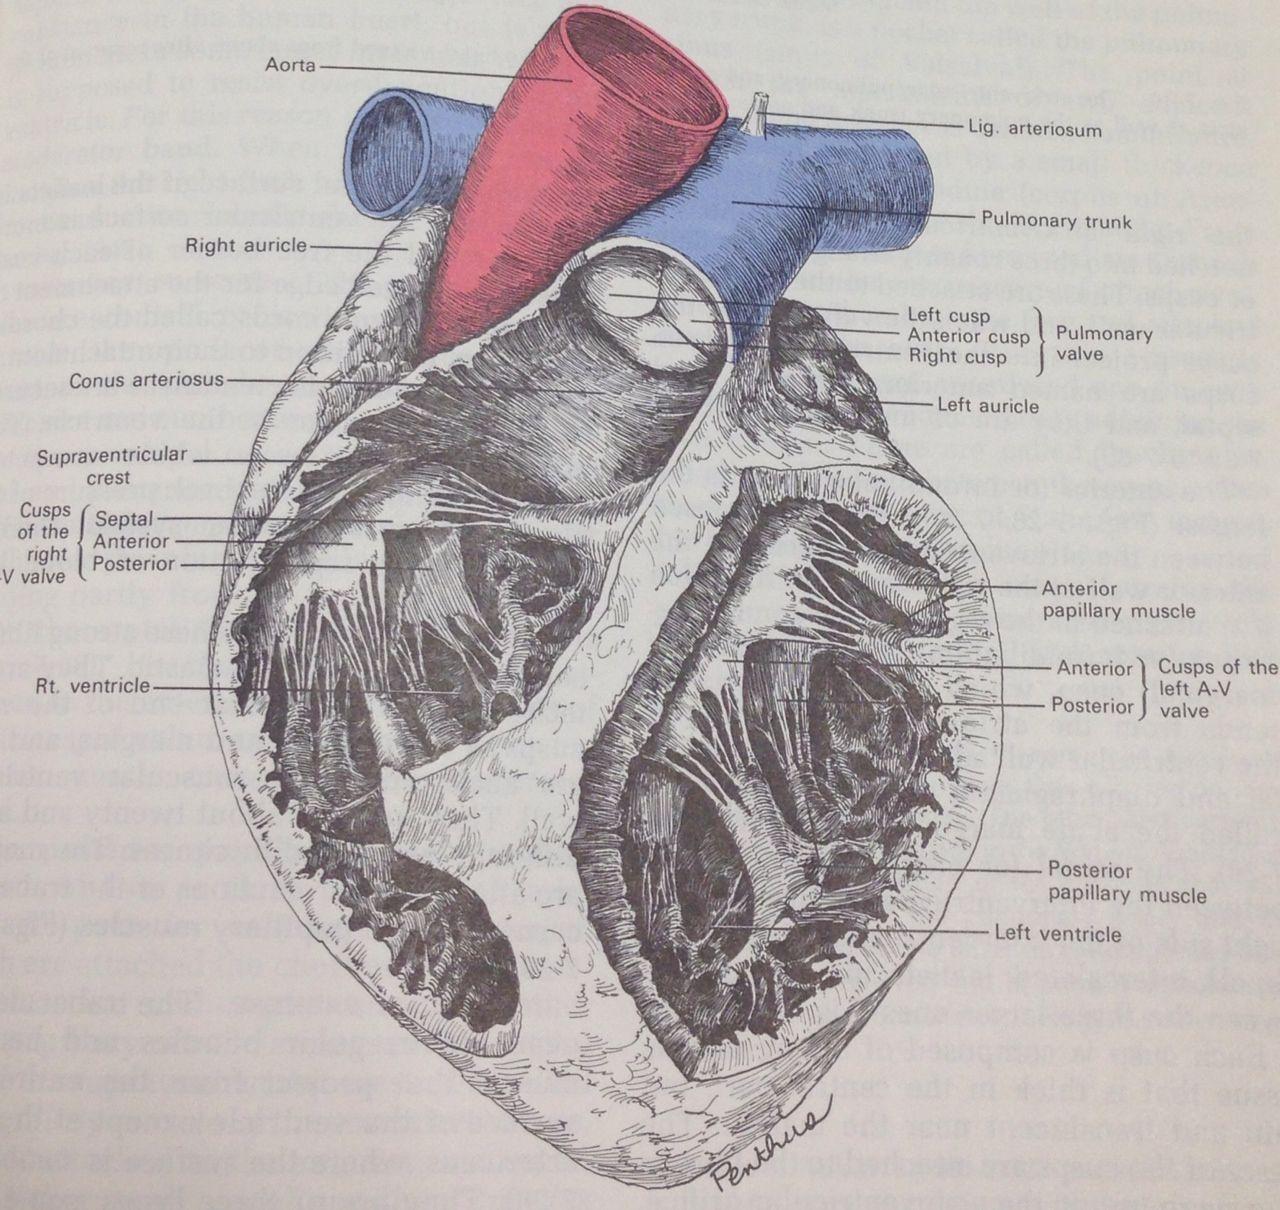 grey's anatomy book heart - Google Search   Greys anatomy ...